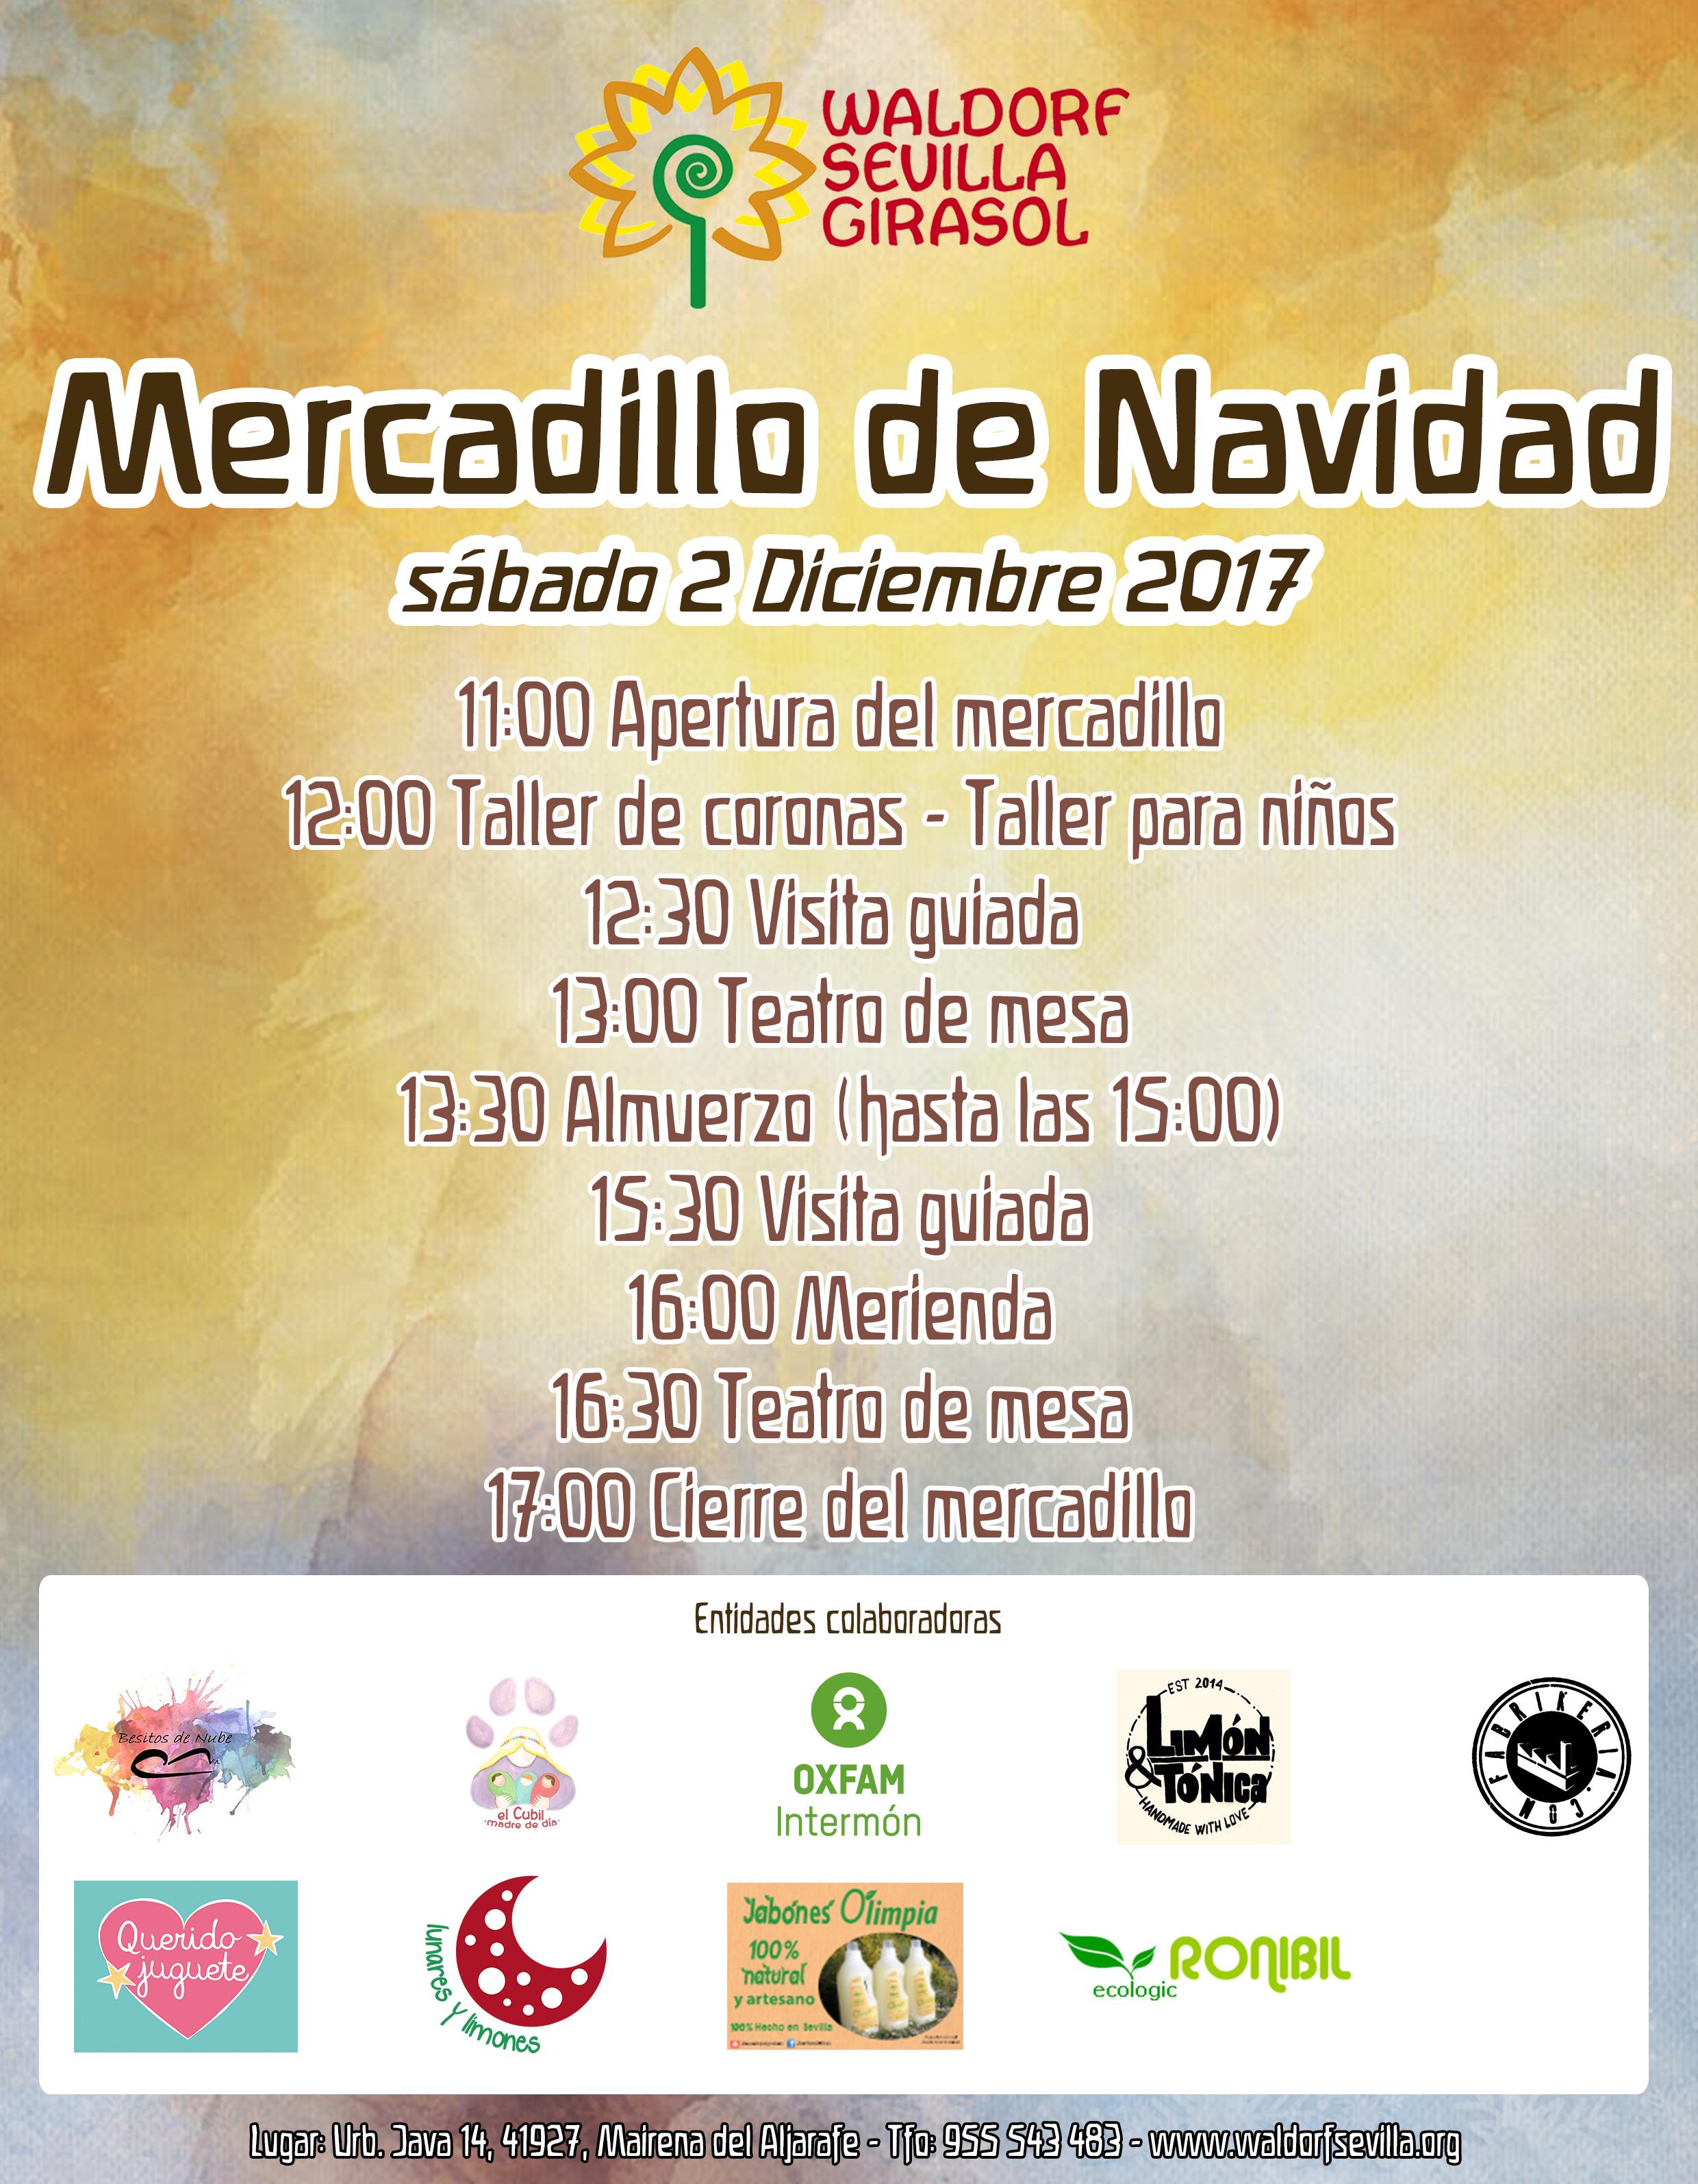 Mercadillo de Navidad 2 diciembre/Christmas market 2nd december